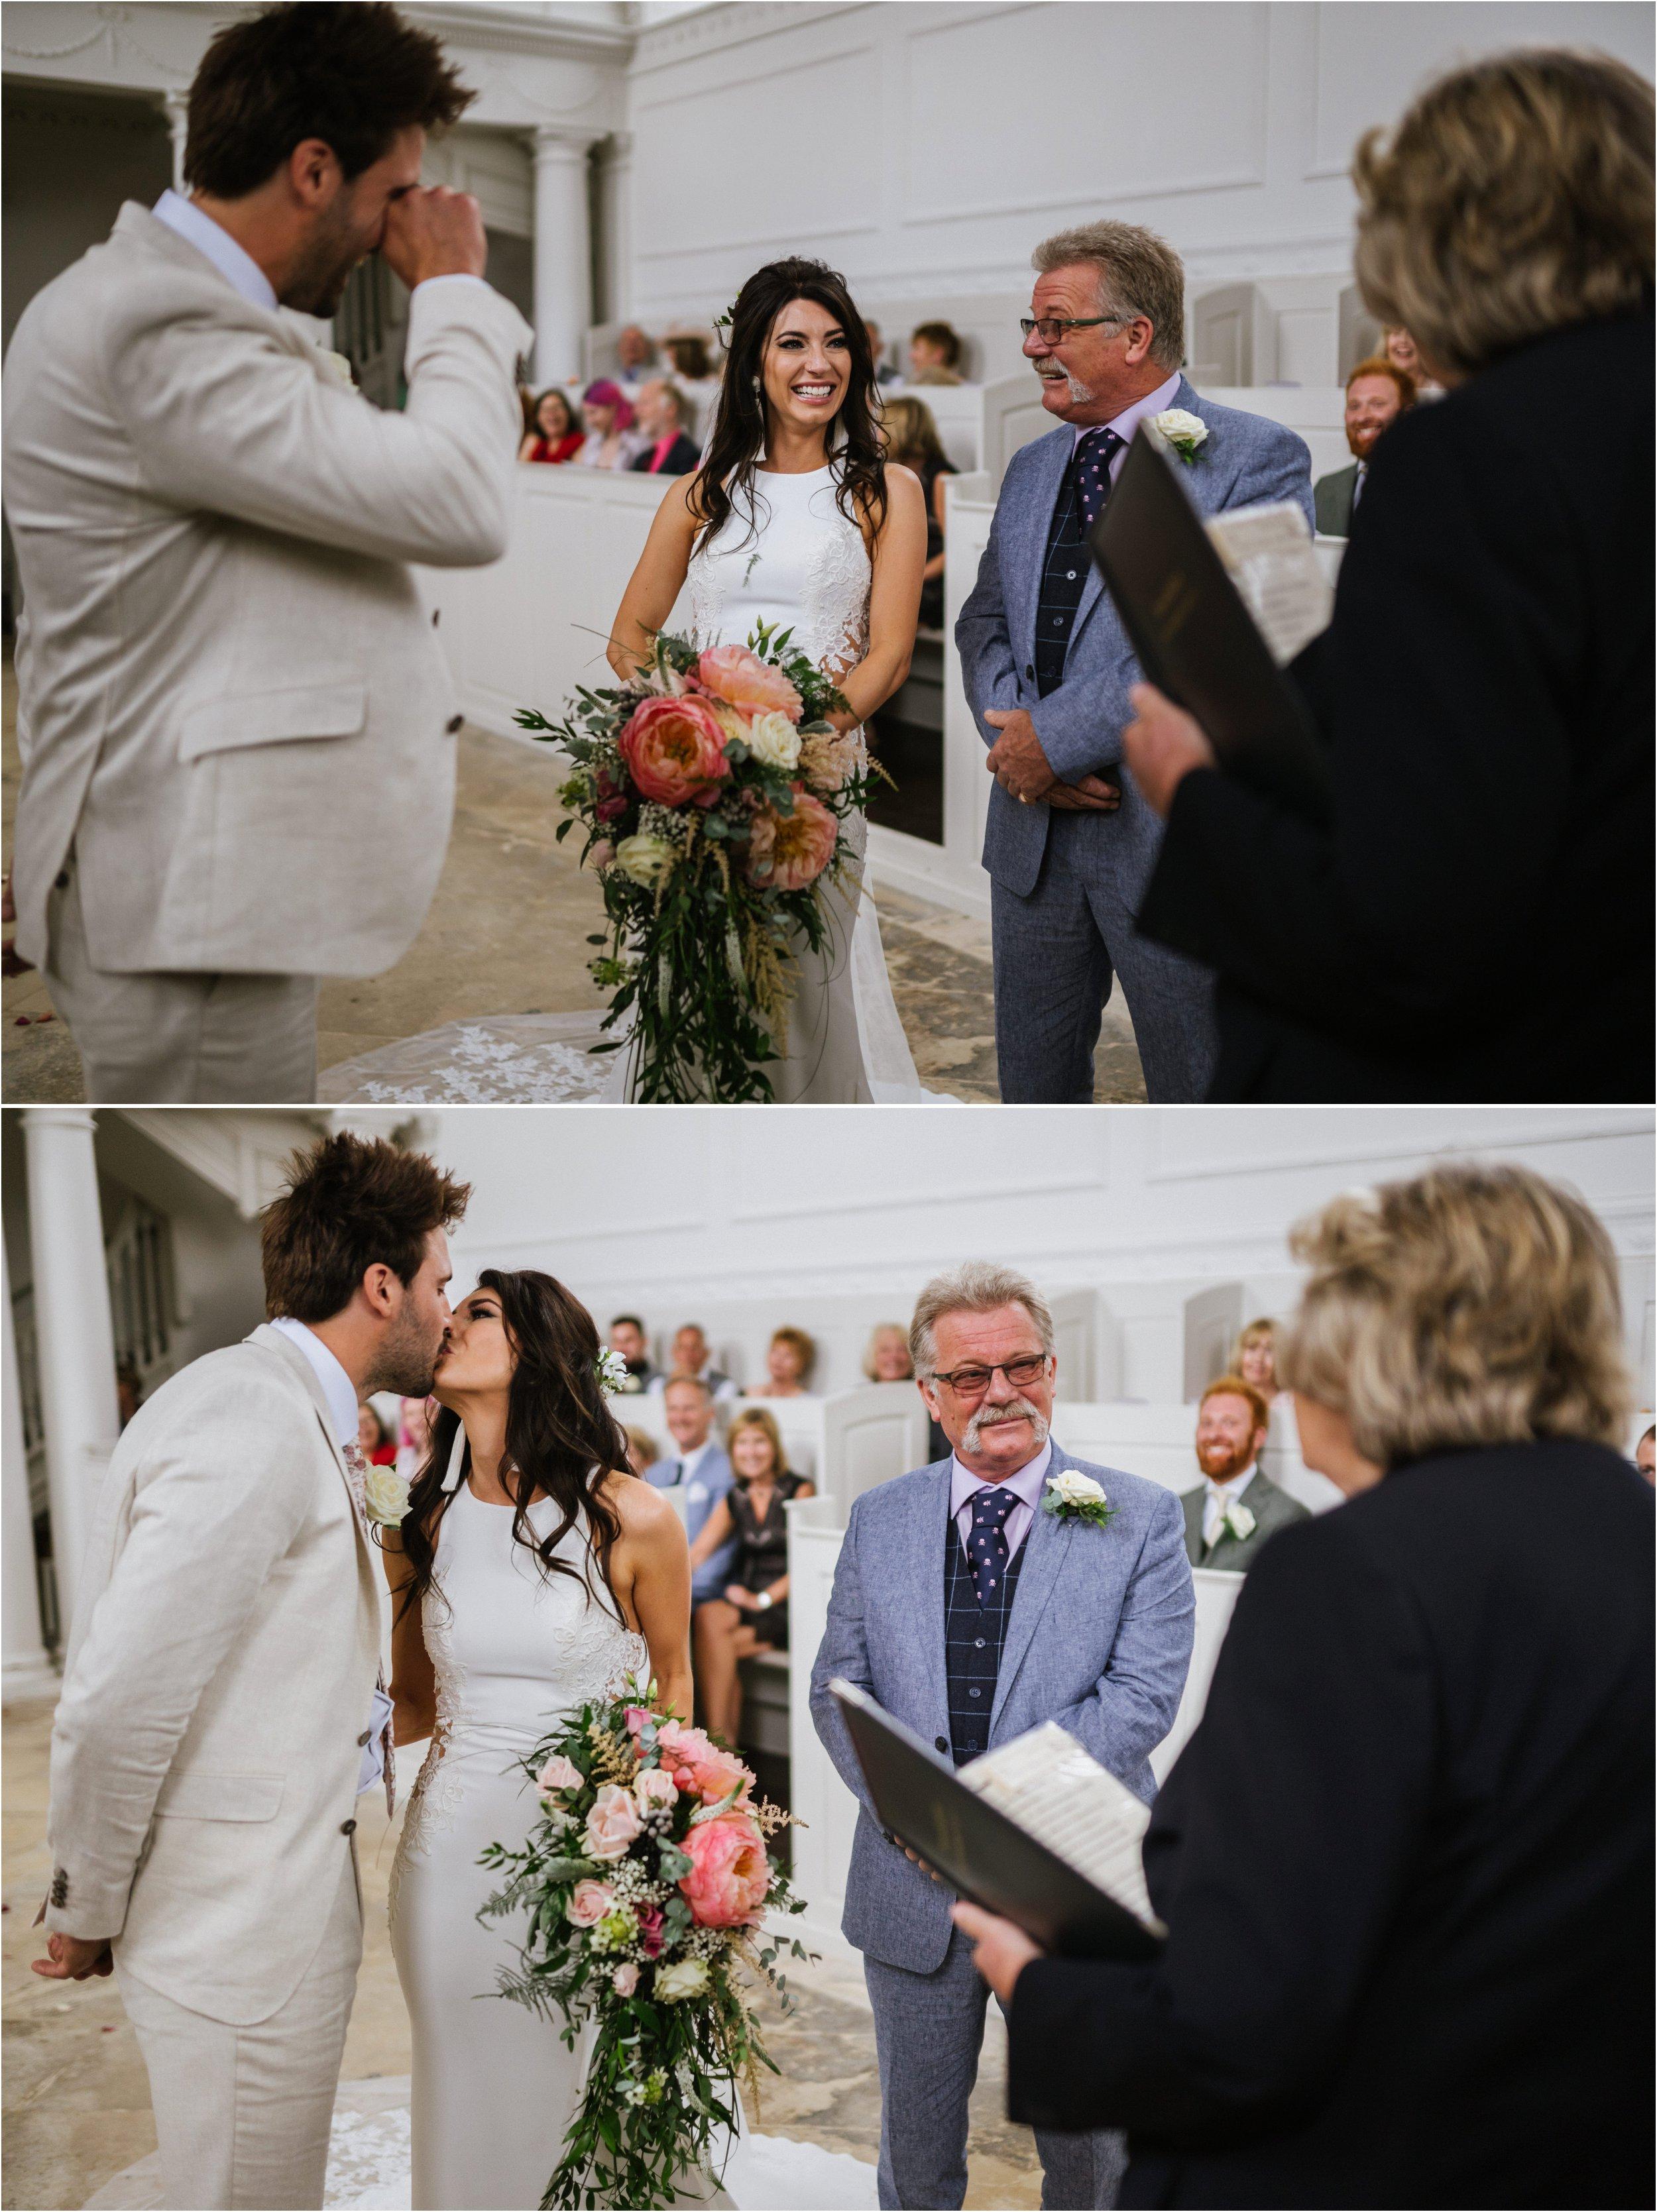 Compton Verney wedding photography_0055.jpg